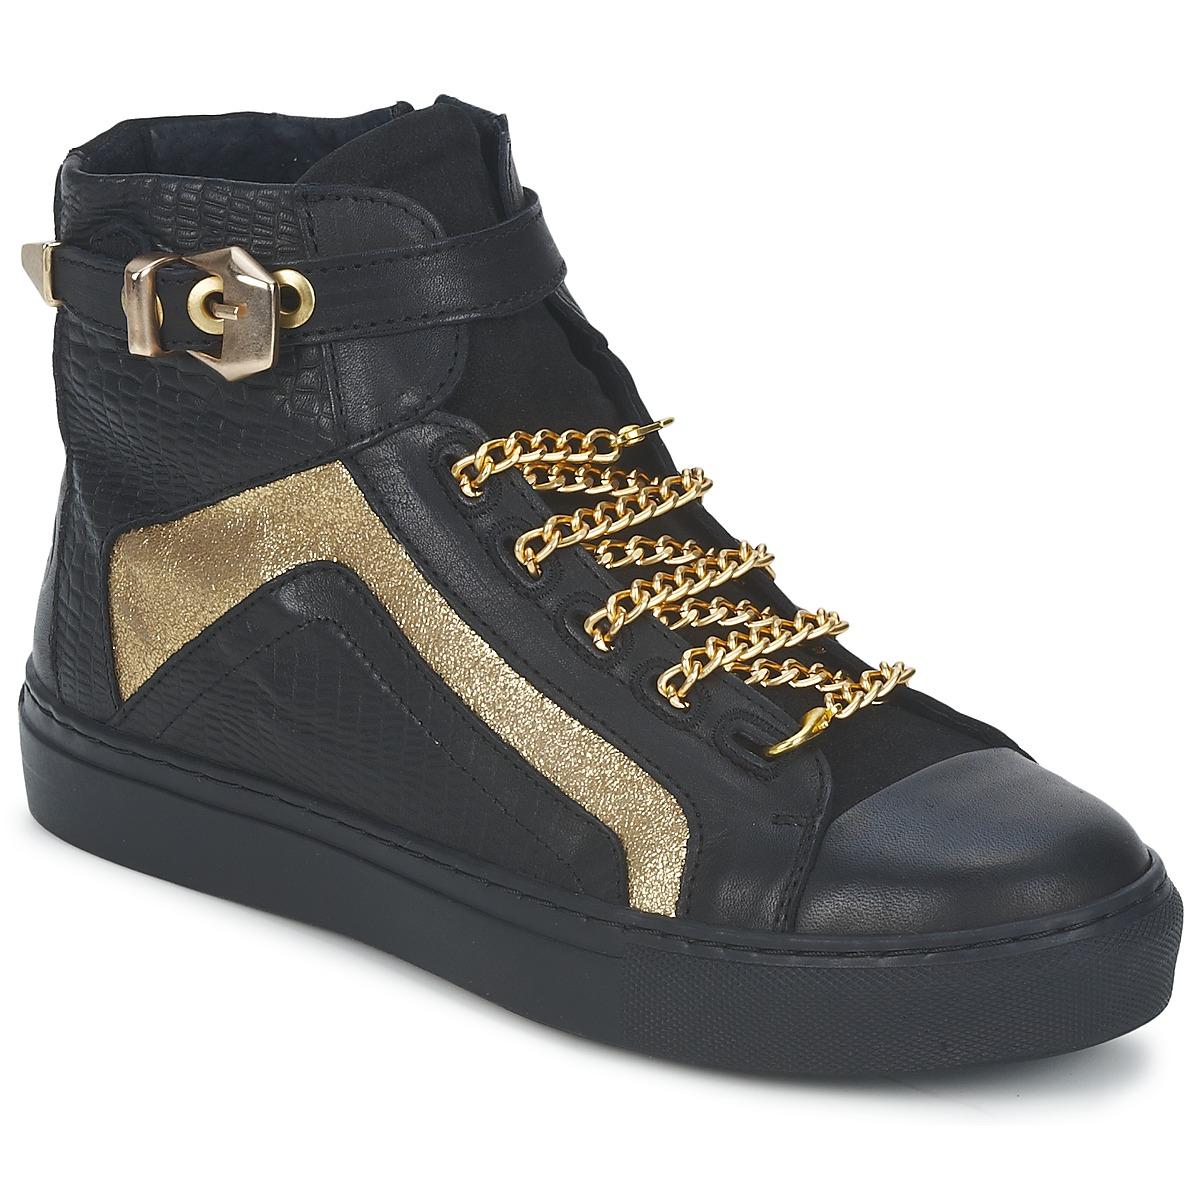 Sneaker High Bronx KYTE Schwarz - Kostenloser Versand ! - Schuhe Damen 77,40 €